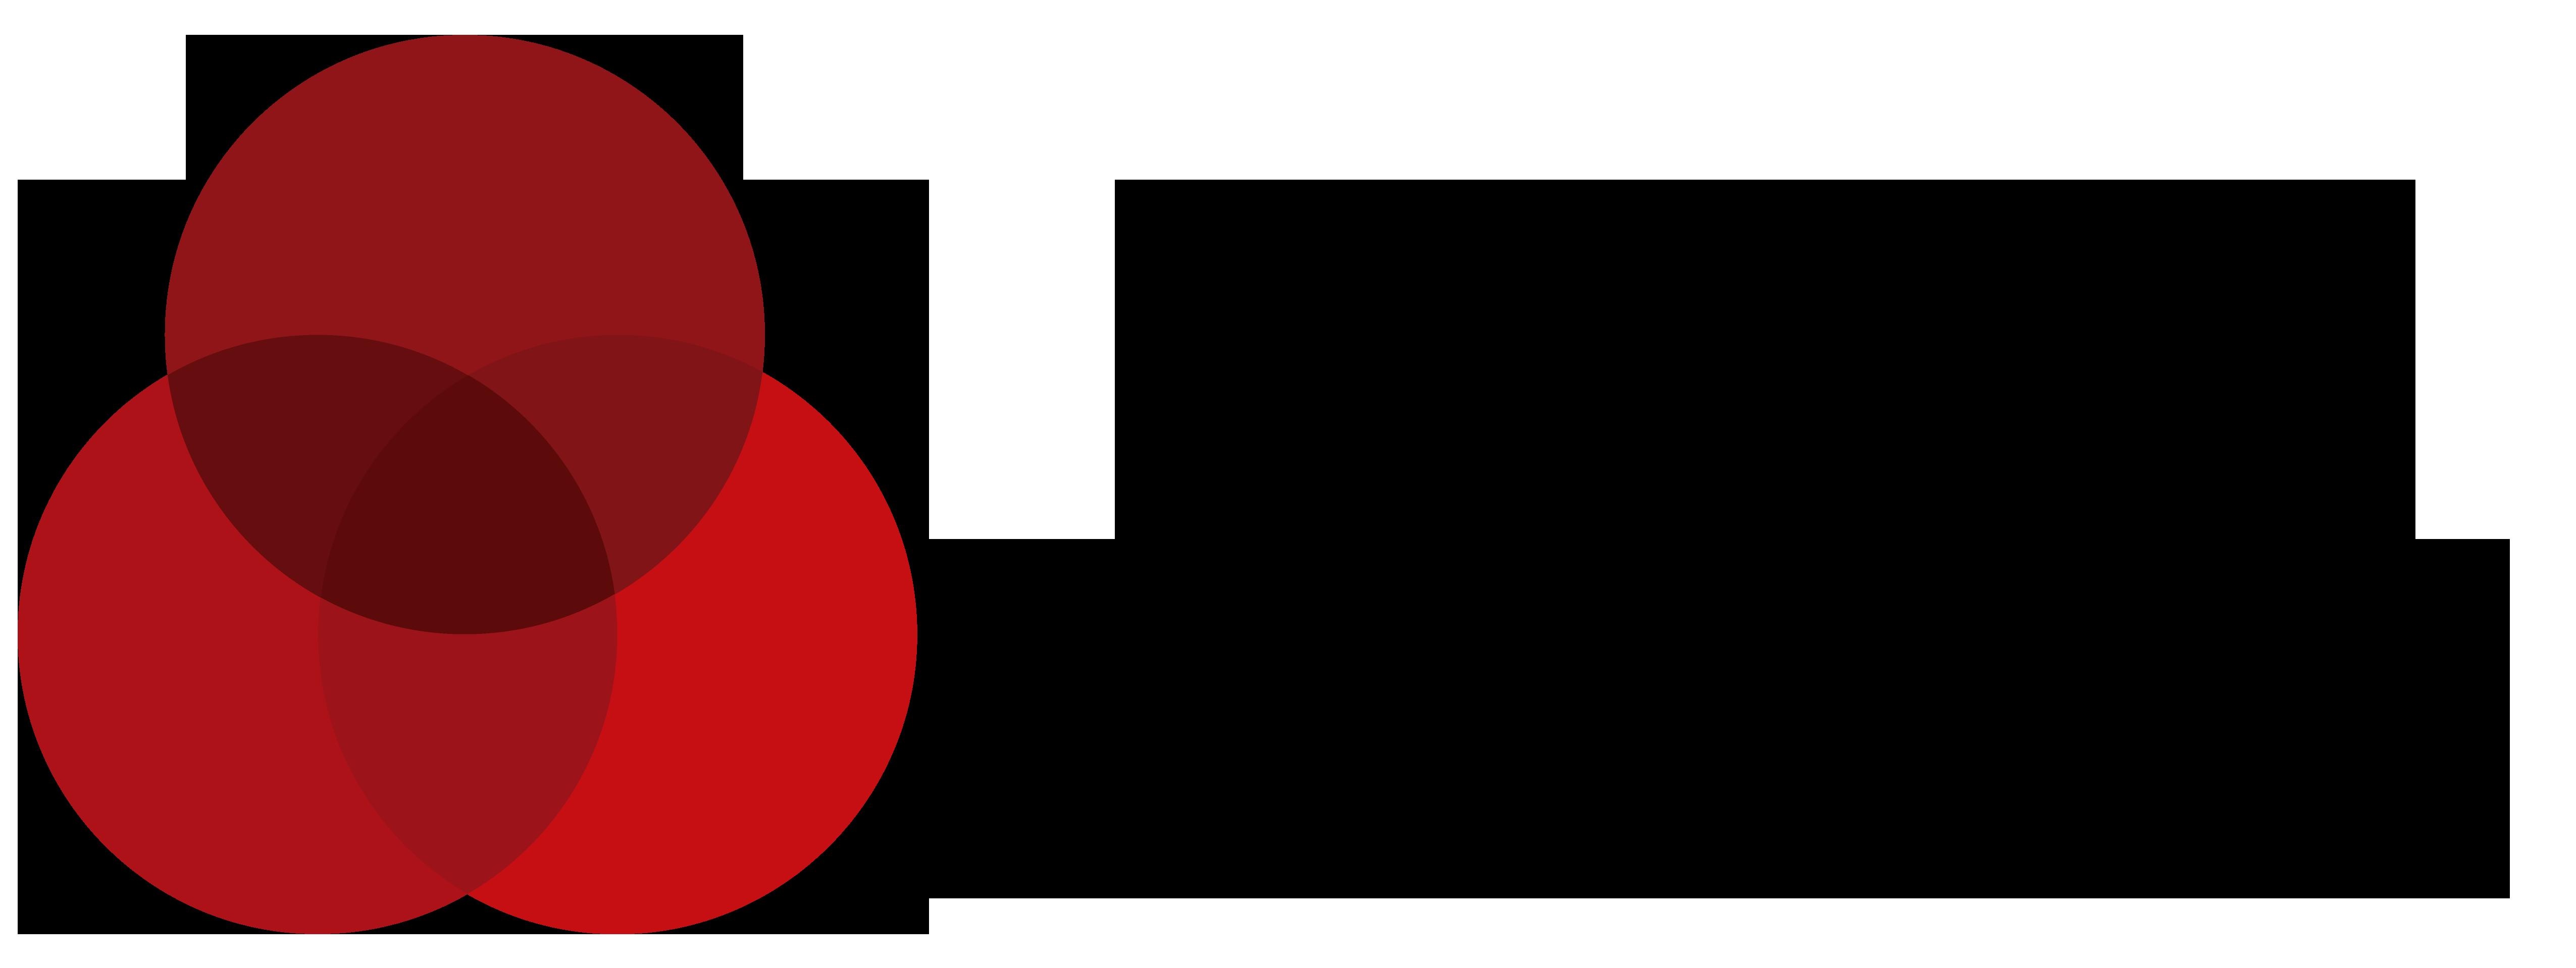 CREUP - Coordinadora de Representantes de Universidades Públicas